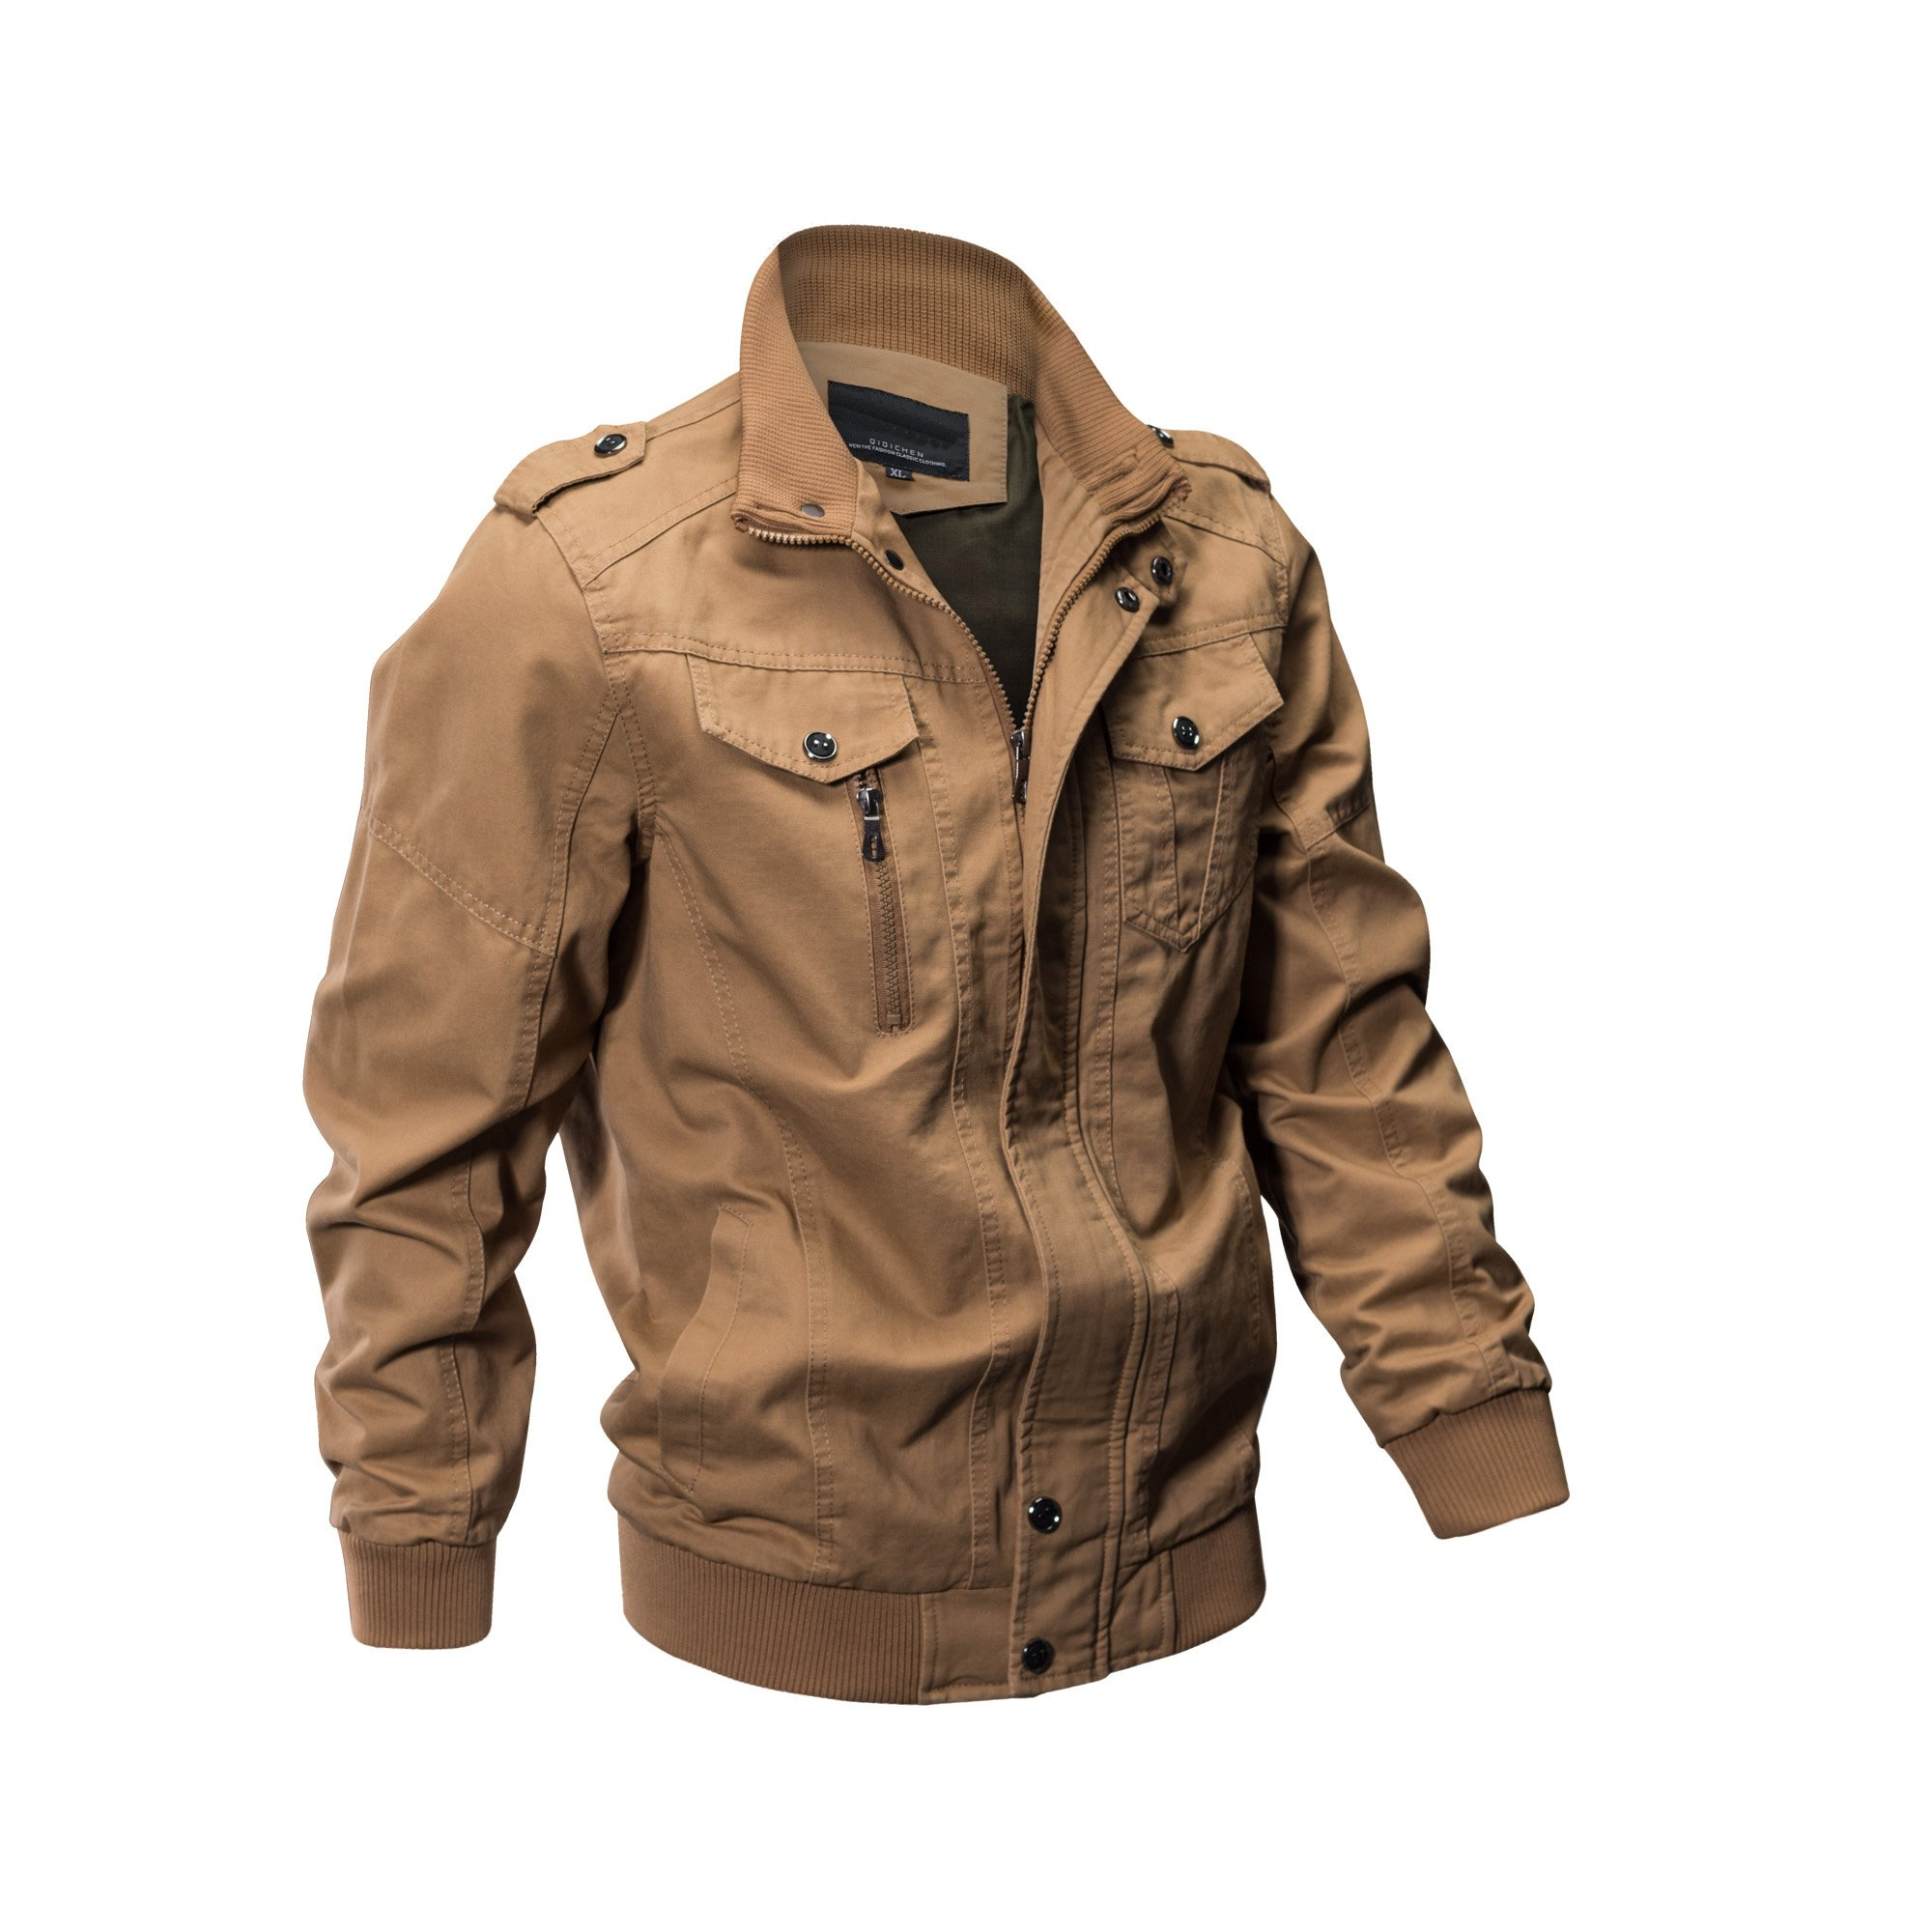 ZooYung Men's Casual Winter Cotton Military Jackets Outdoor Coat windproof windbreaker(2701-Khaki-XL) by ZooYung